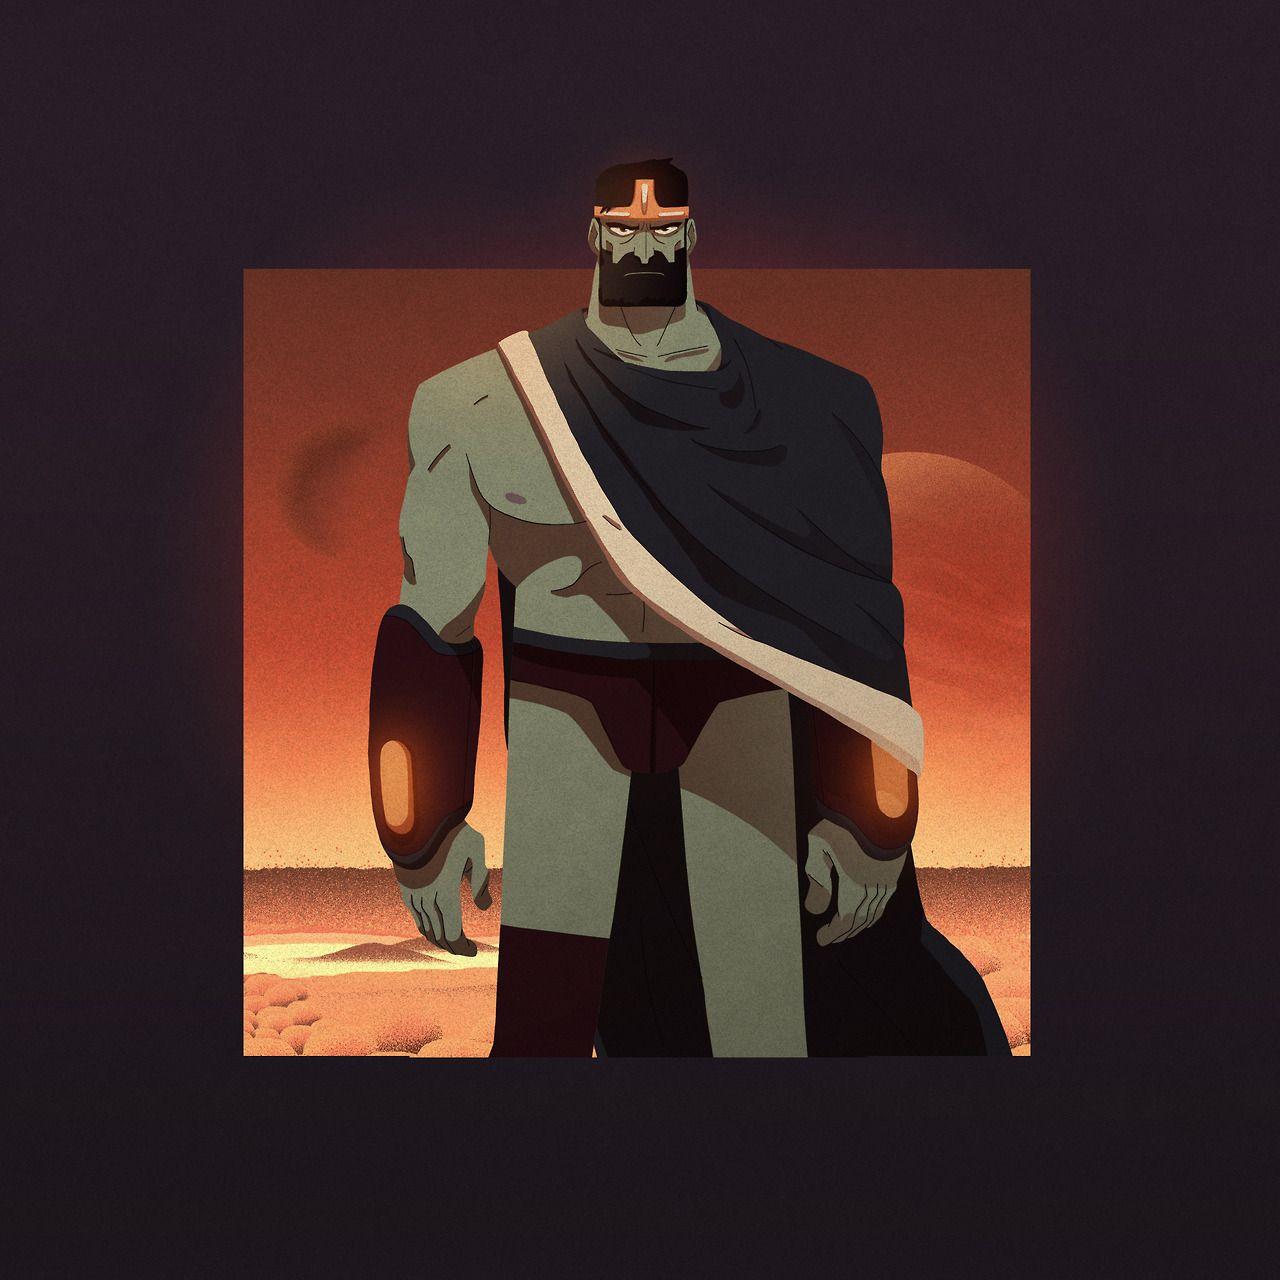 C2c Delta Animation Design Character Design Animation